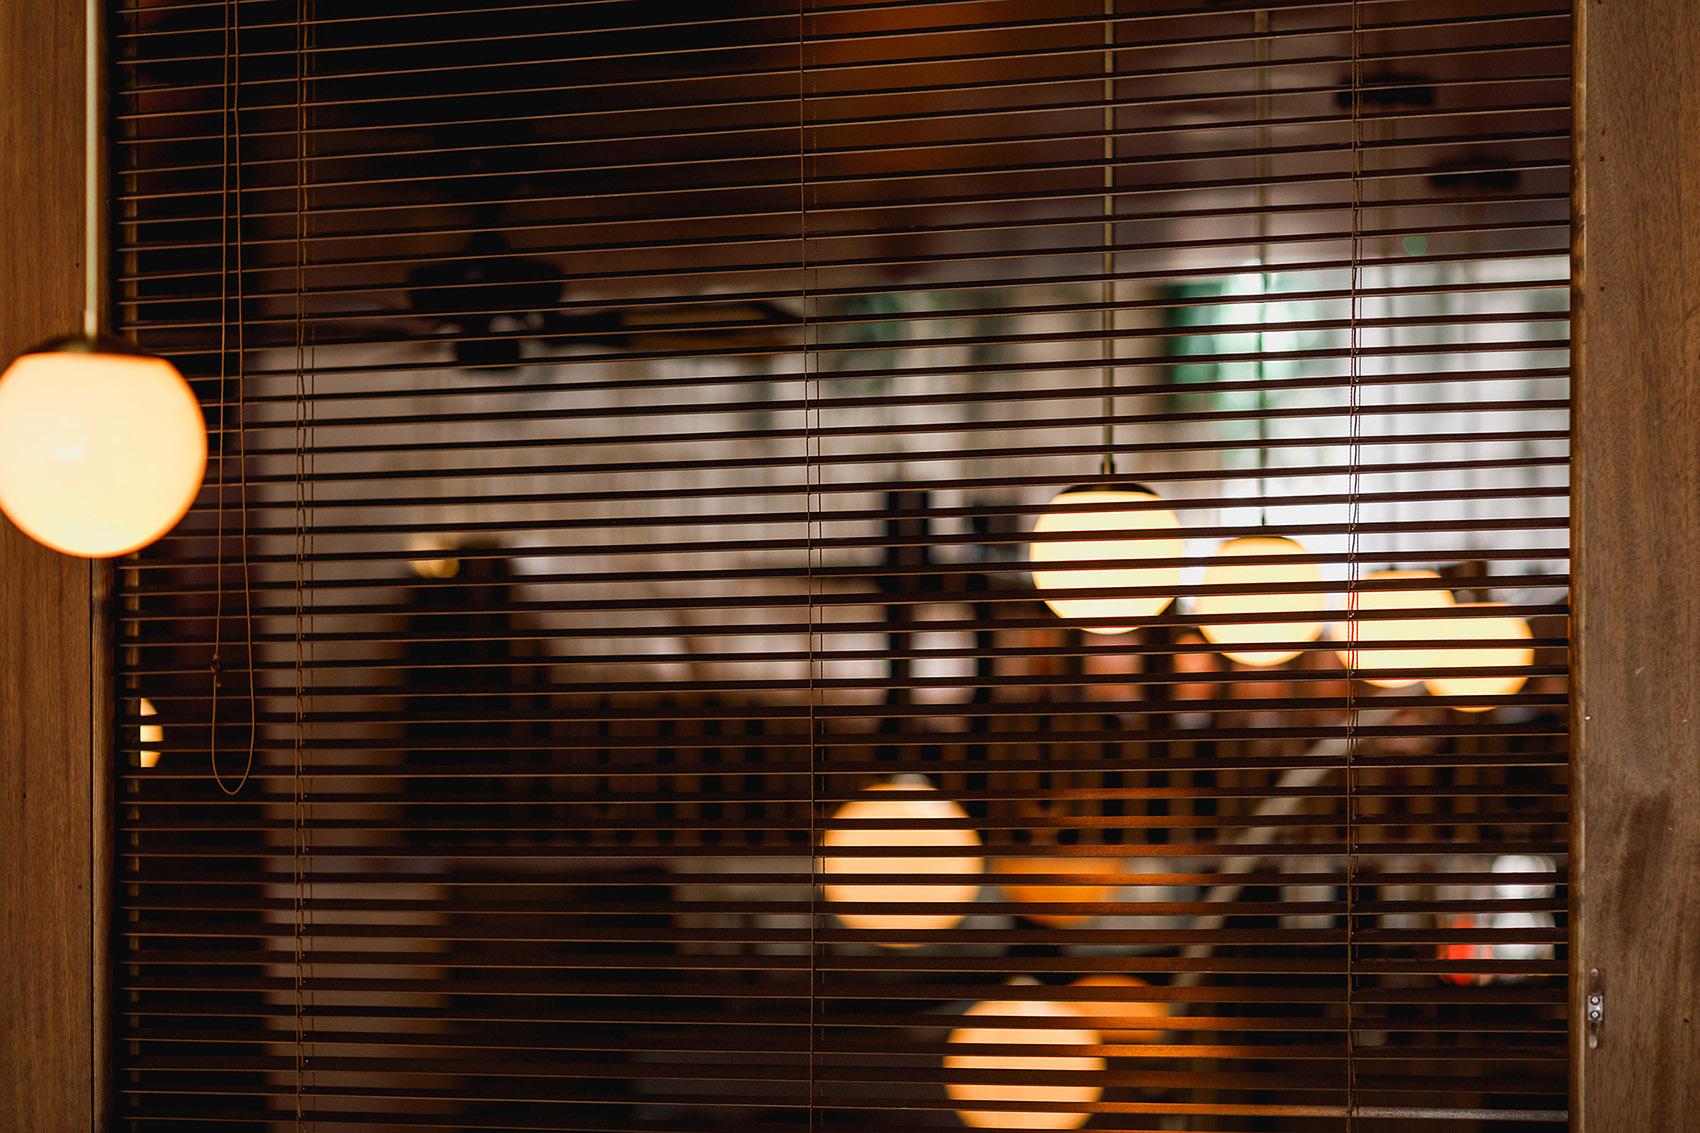 010r-Ceviche-By-A-nrd-Studio